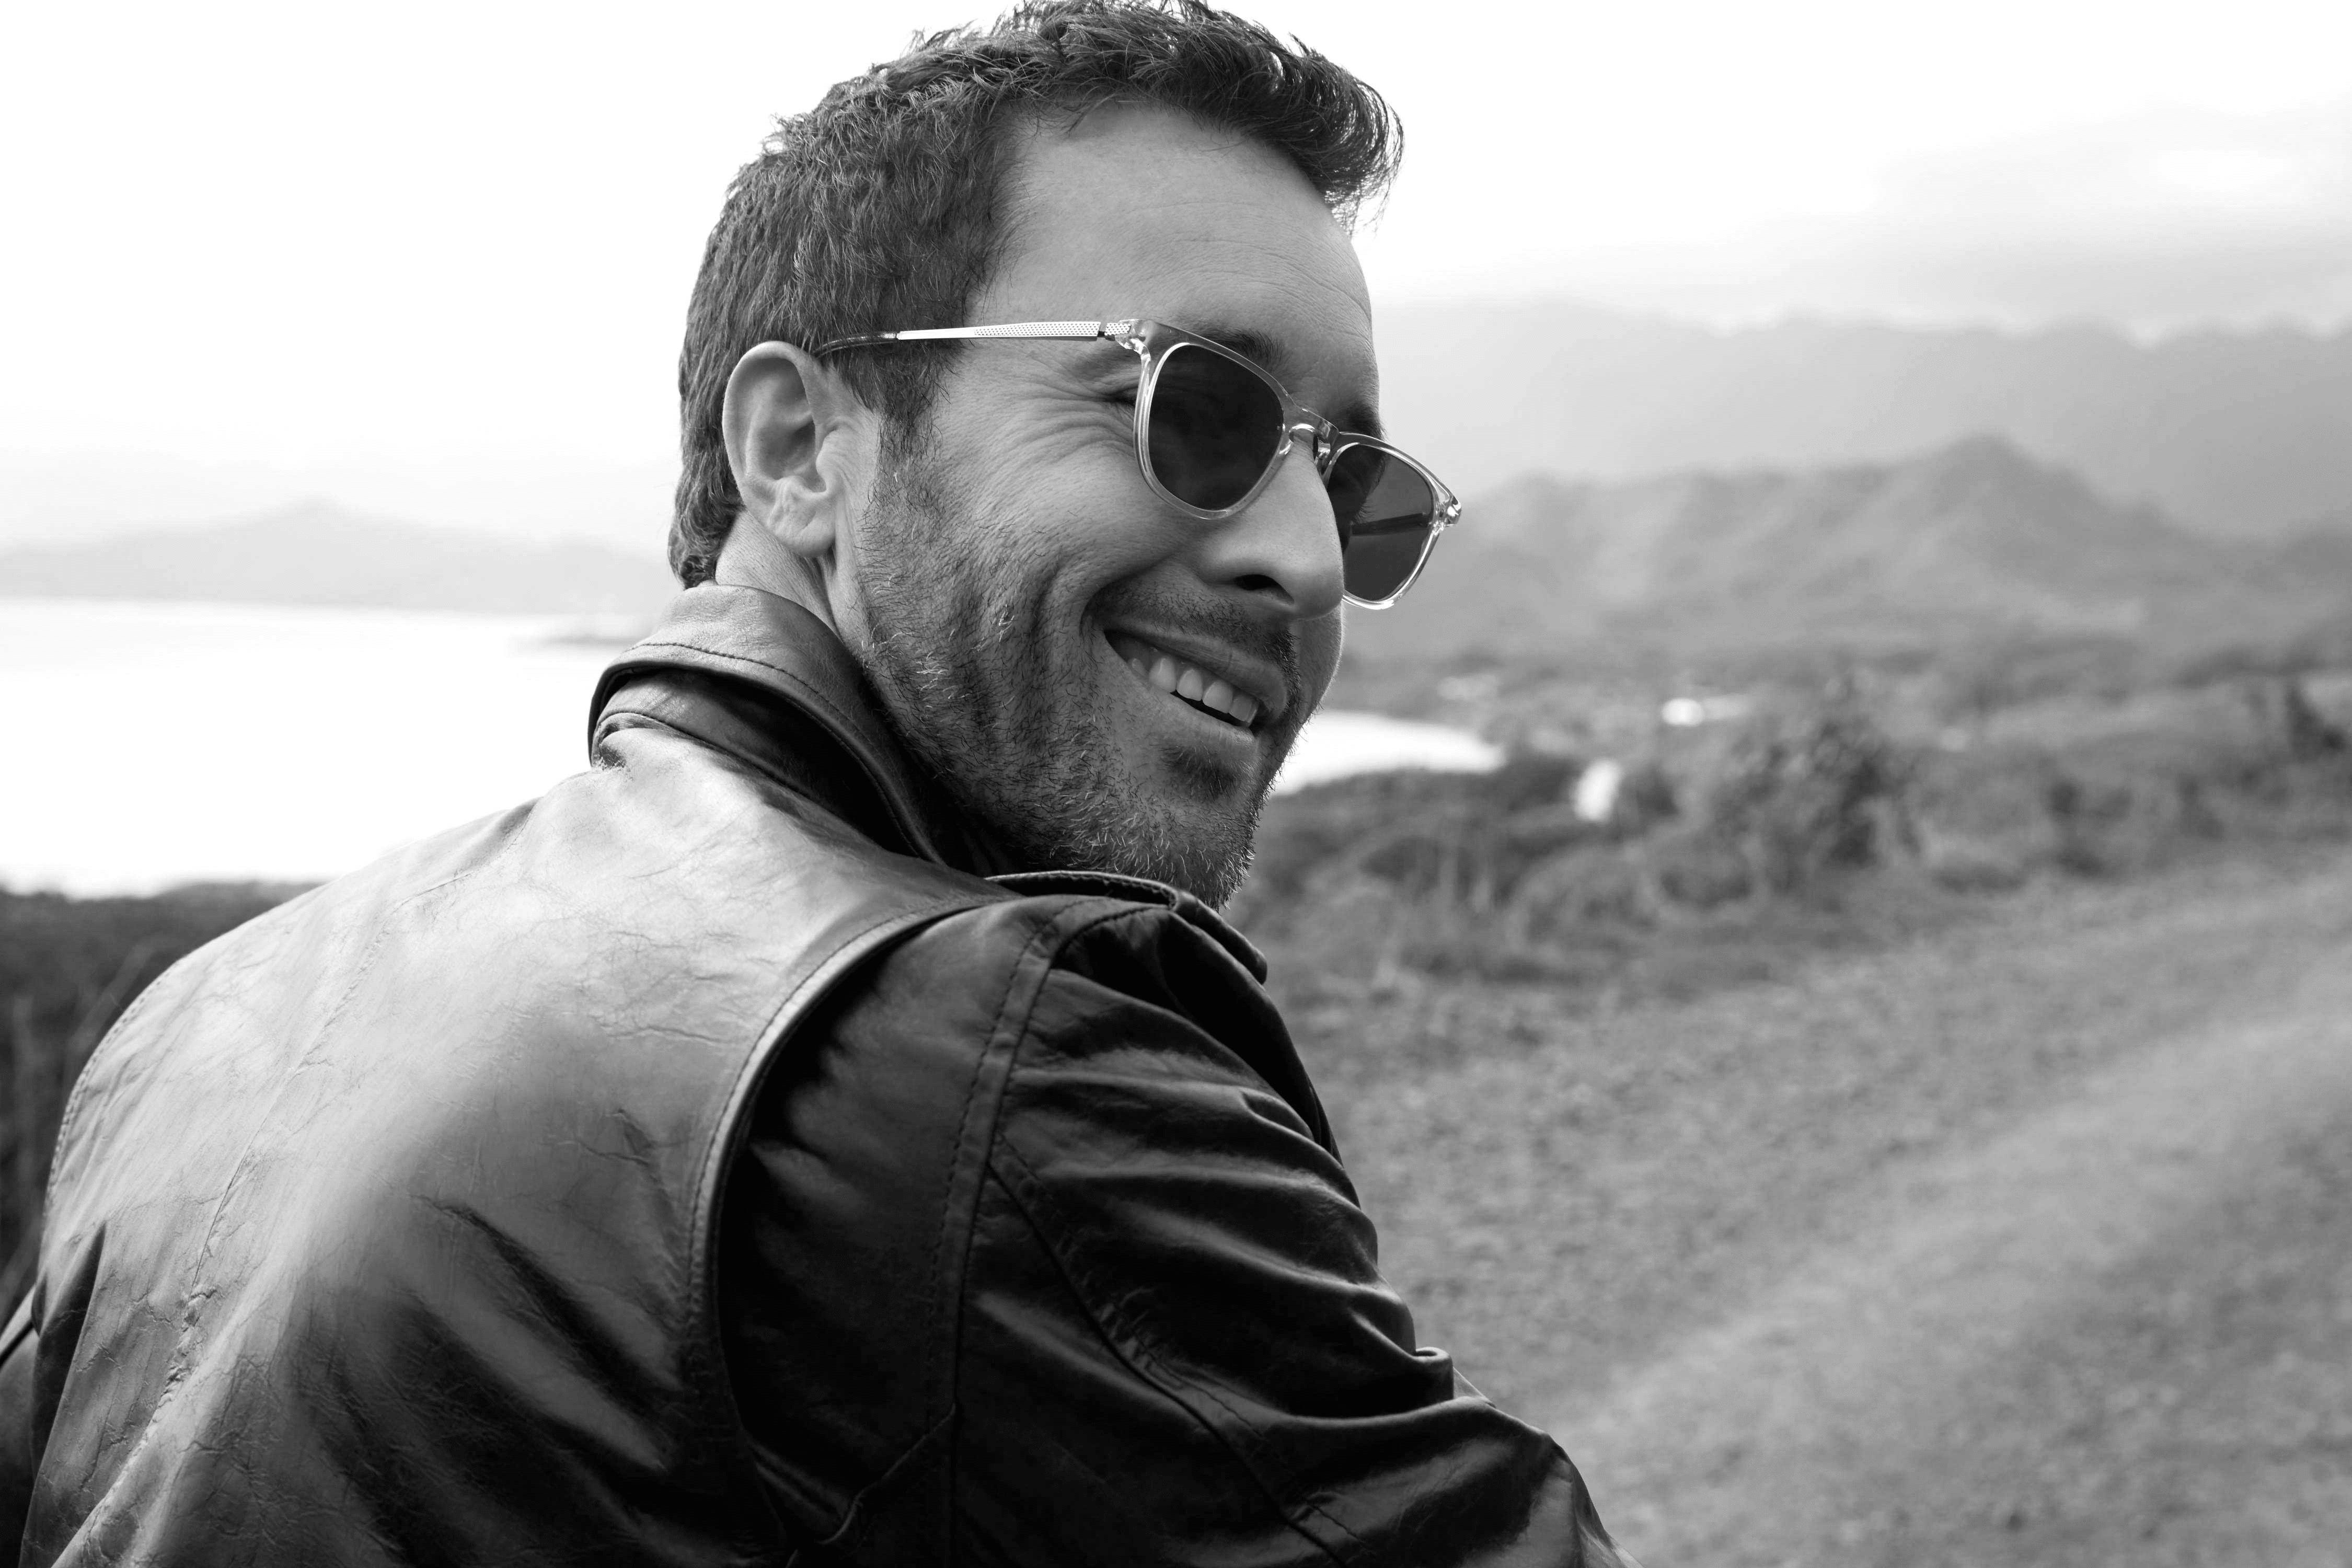 Alex O'Loughlin smiling wearing sunglasses